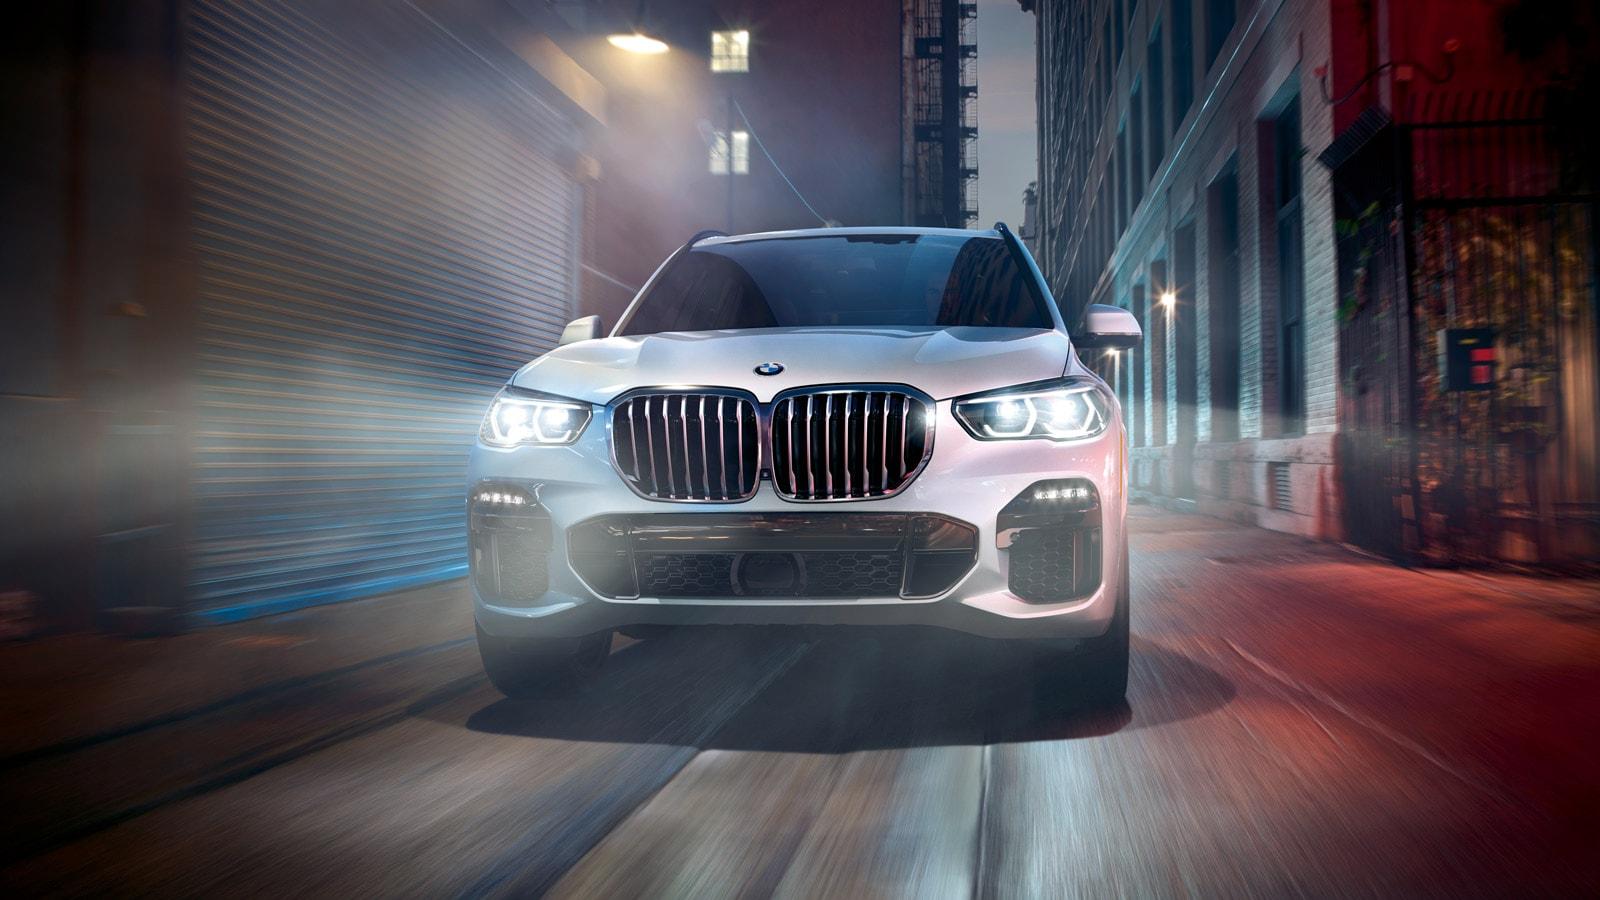 2020 BMW X5 for Sale near Texarkana, TX